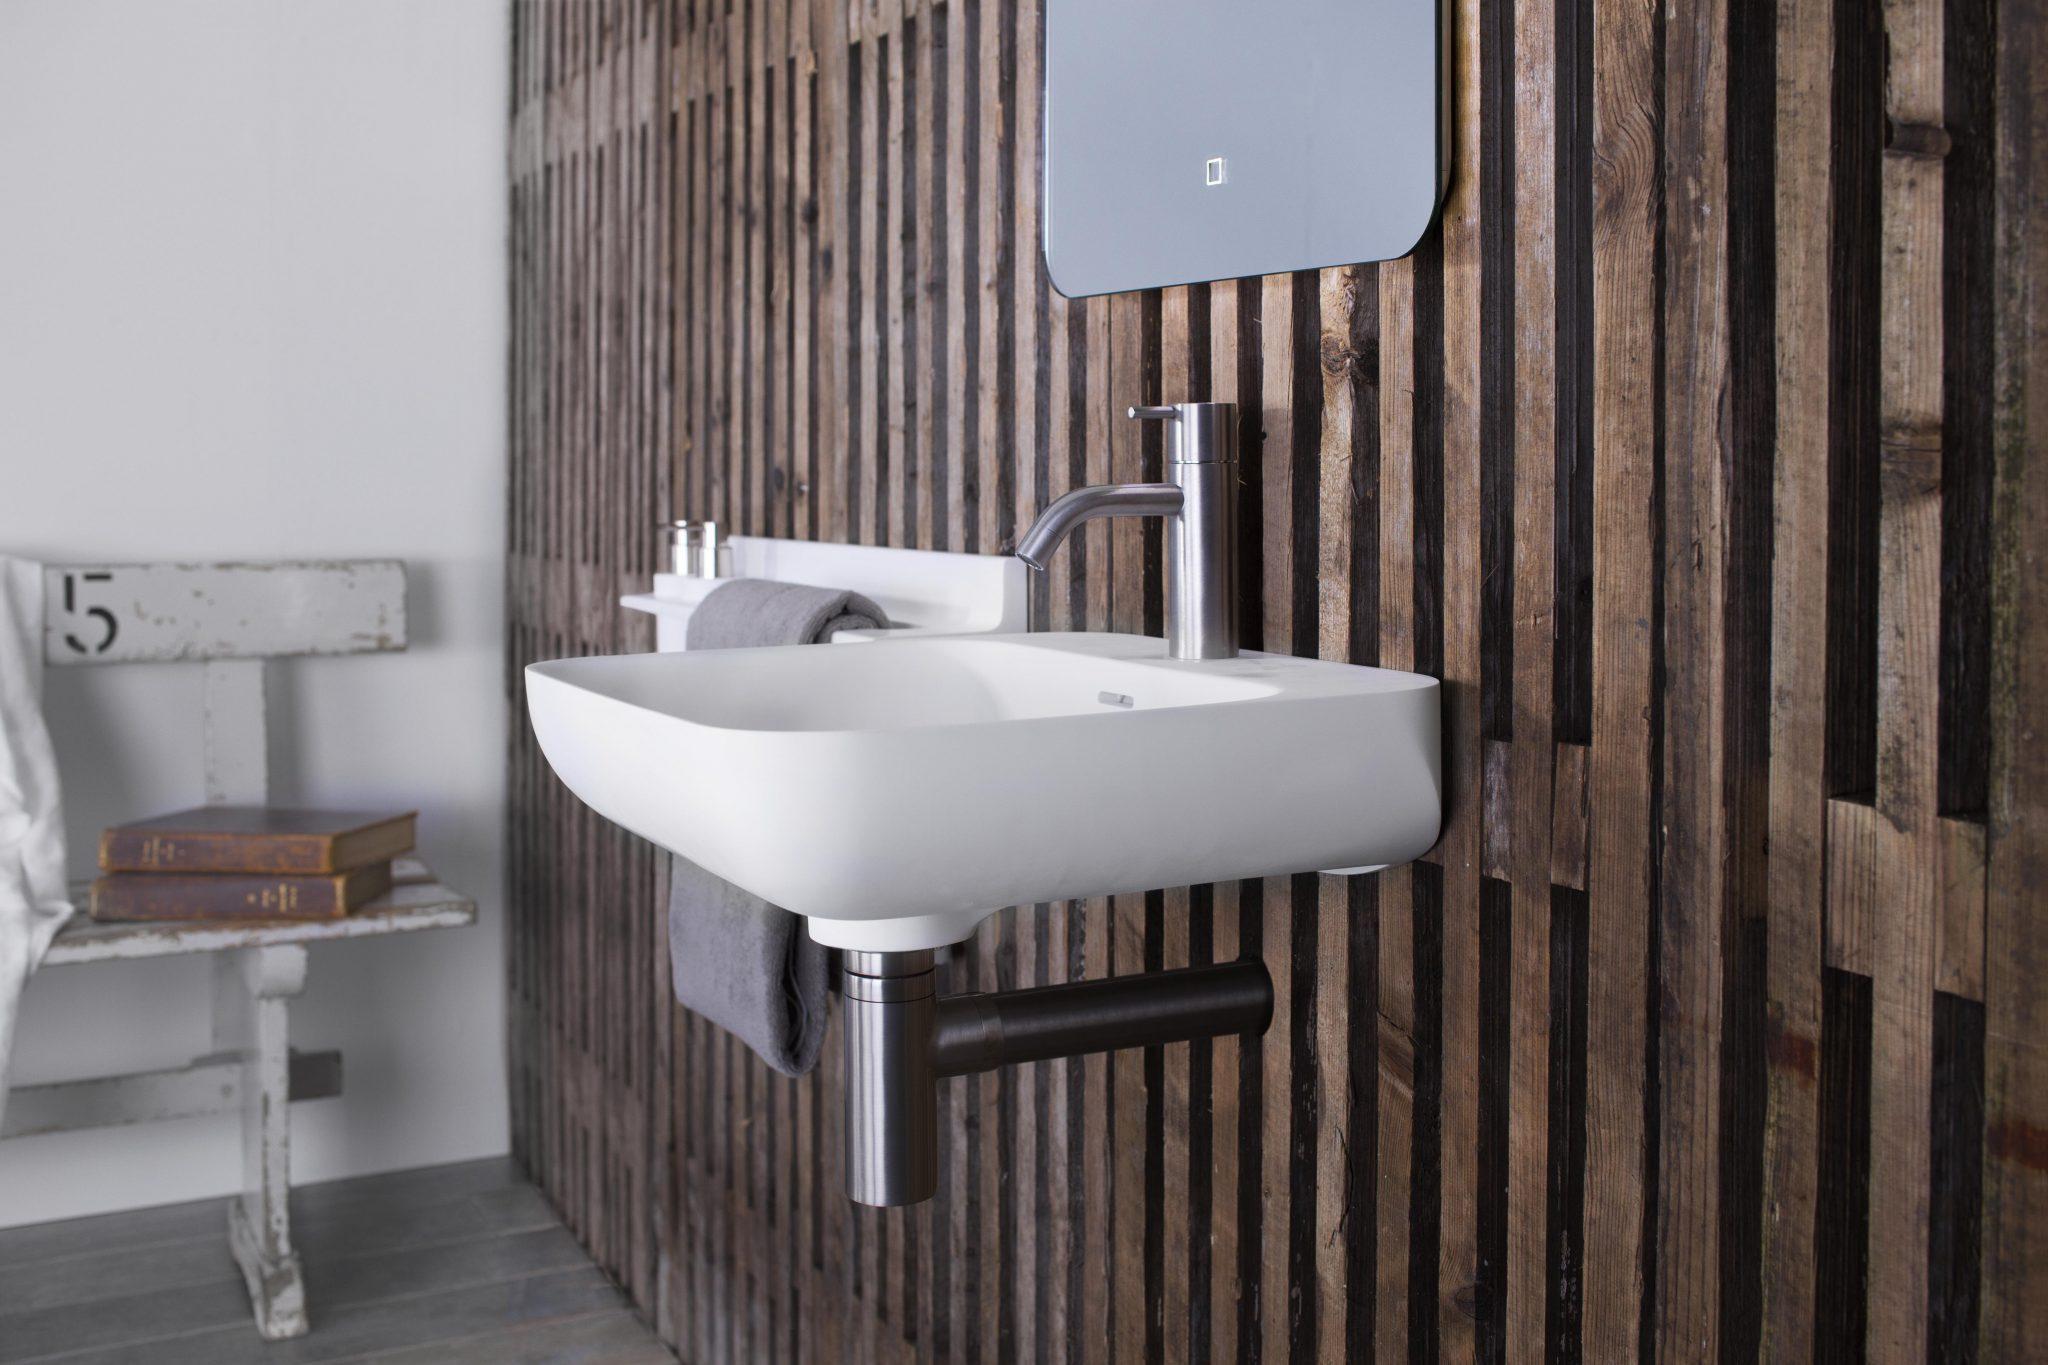 en-40-wash-basin-from-copenhagen-bath_27180594636_o